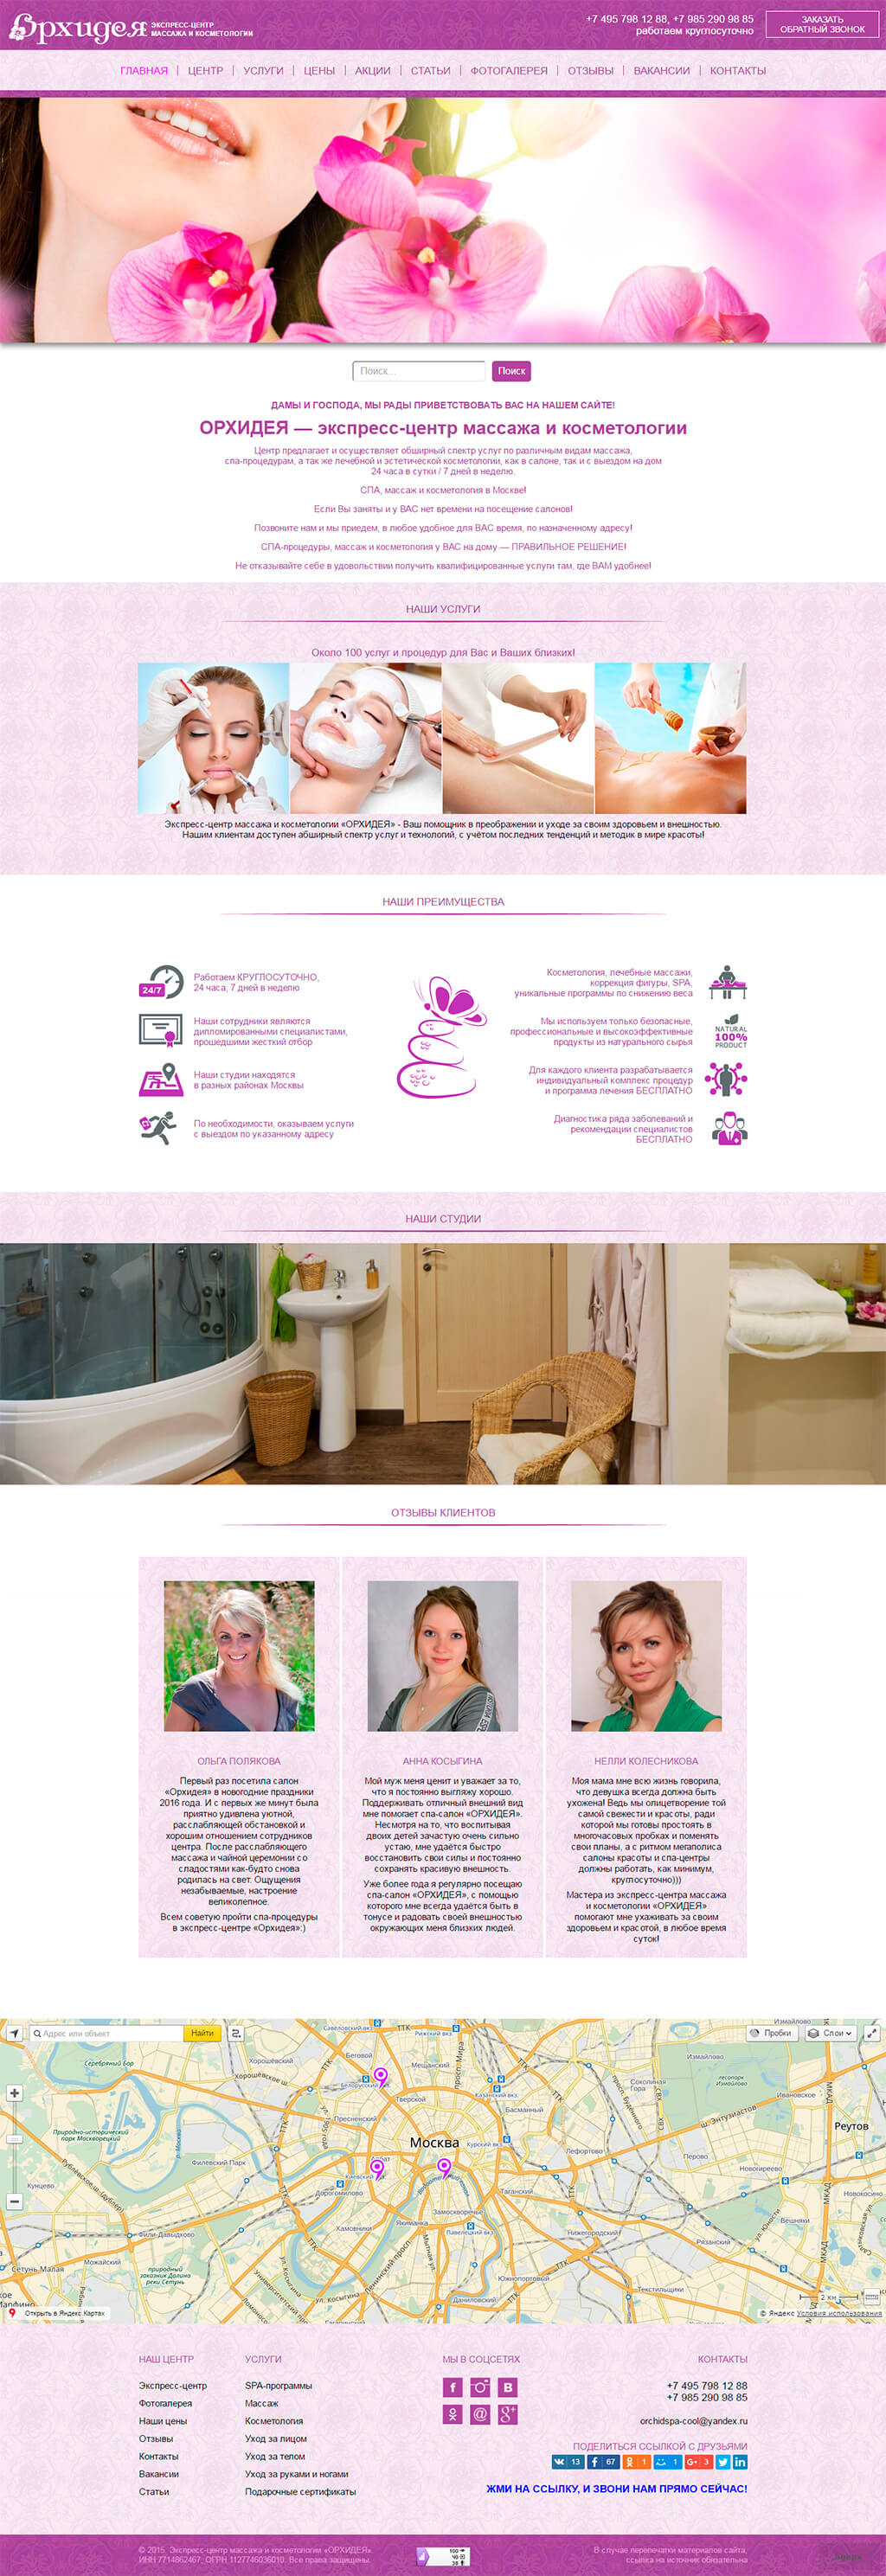 Главная страница сайта spa-салона 'Орхидея'